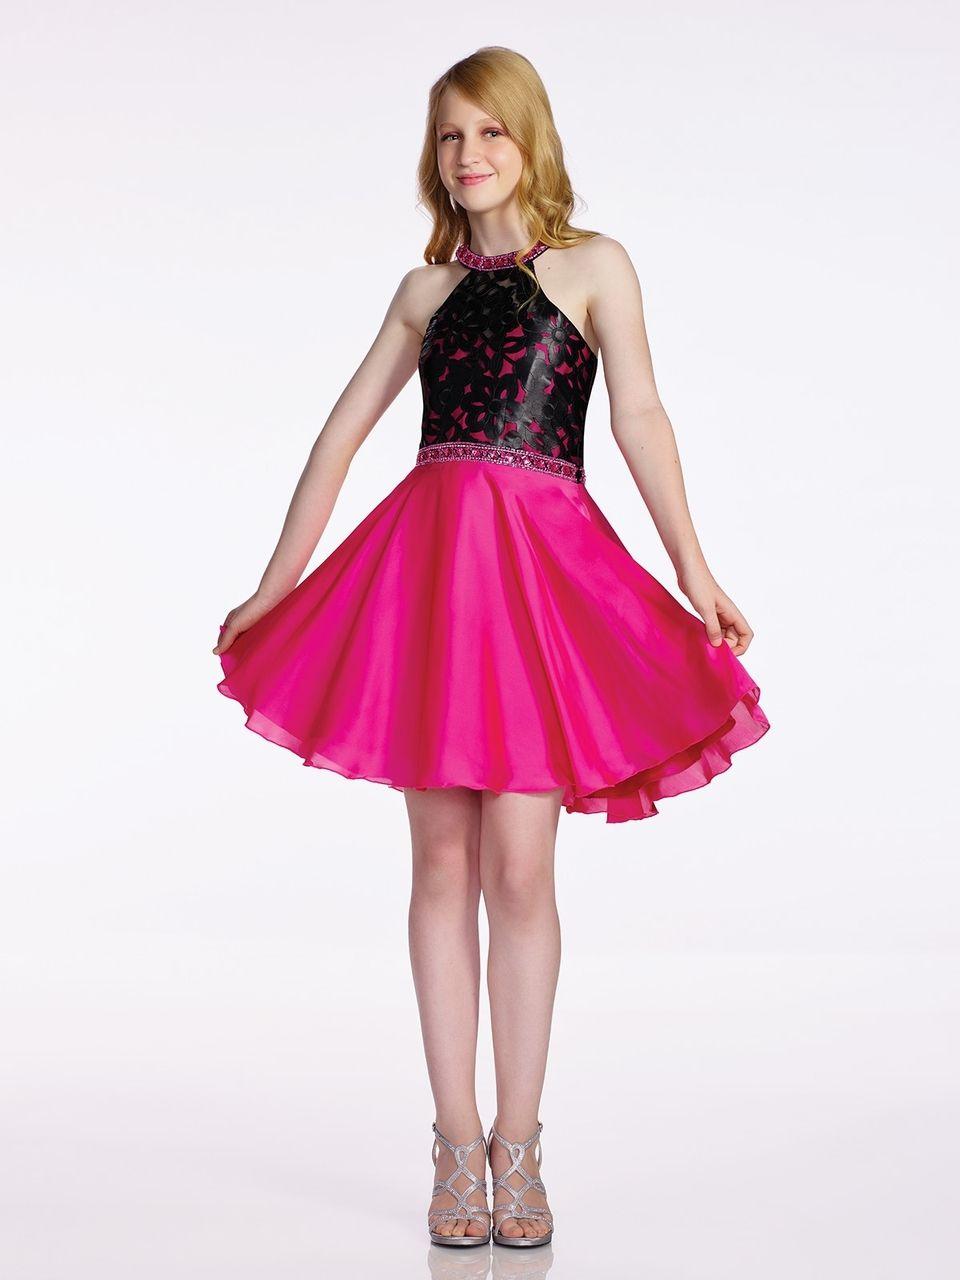 Lexie Girls Cocktail Dress Tw11675 Everythingformals Com Junior Party Dresses Girls Dresses Little Girl Dresses [ 1280 x 960 Pixel ]